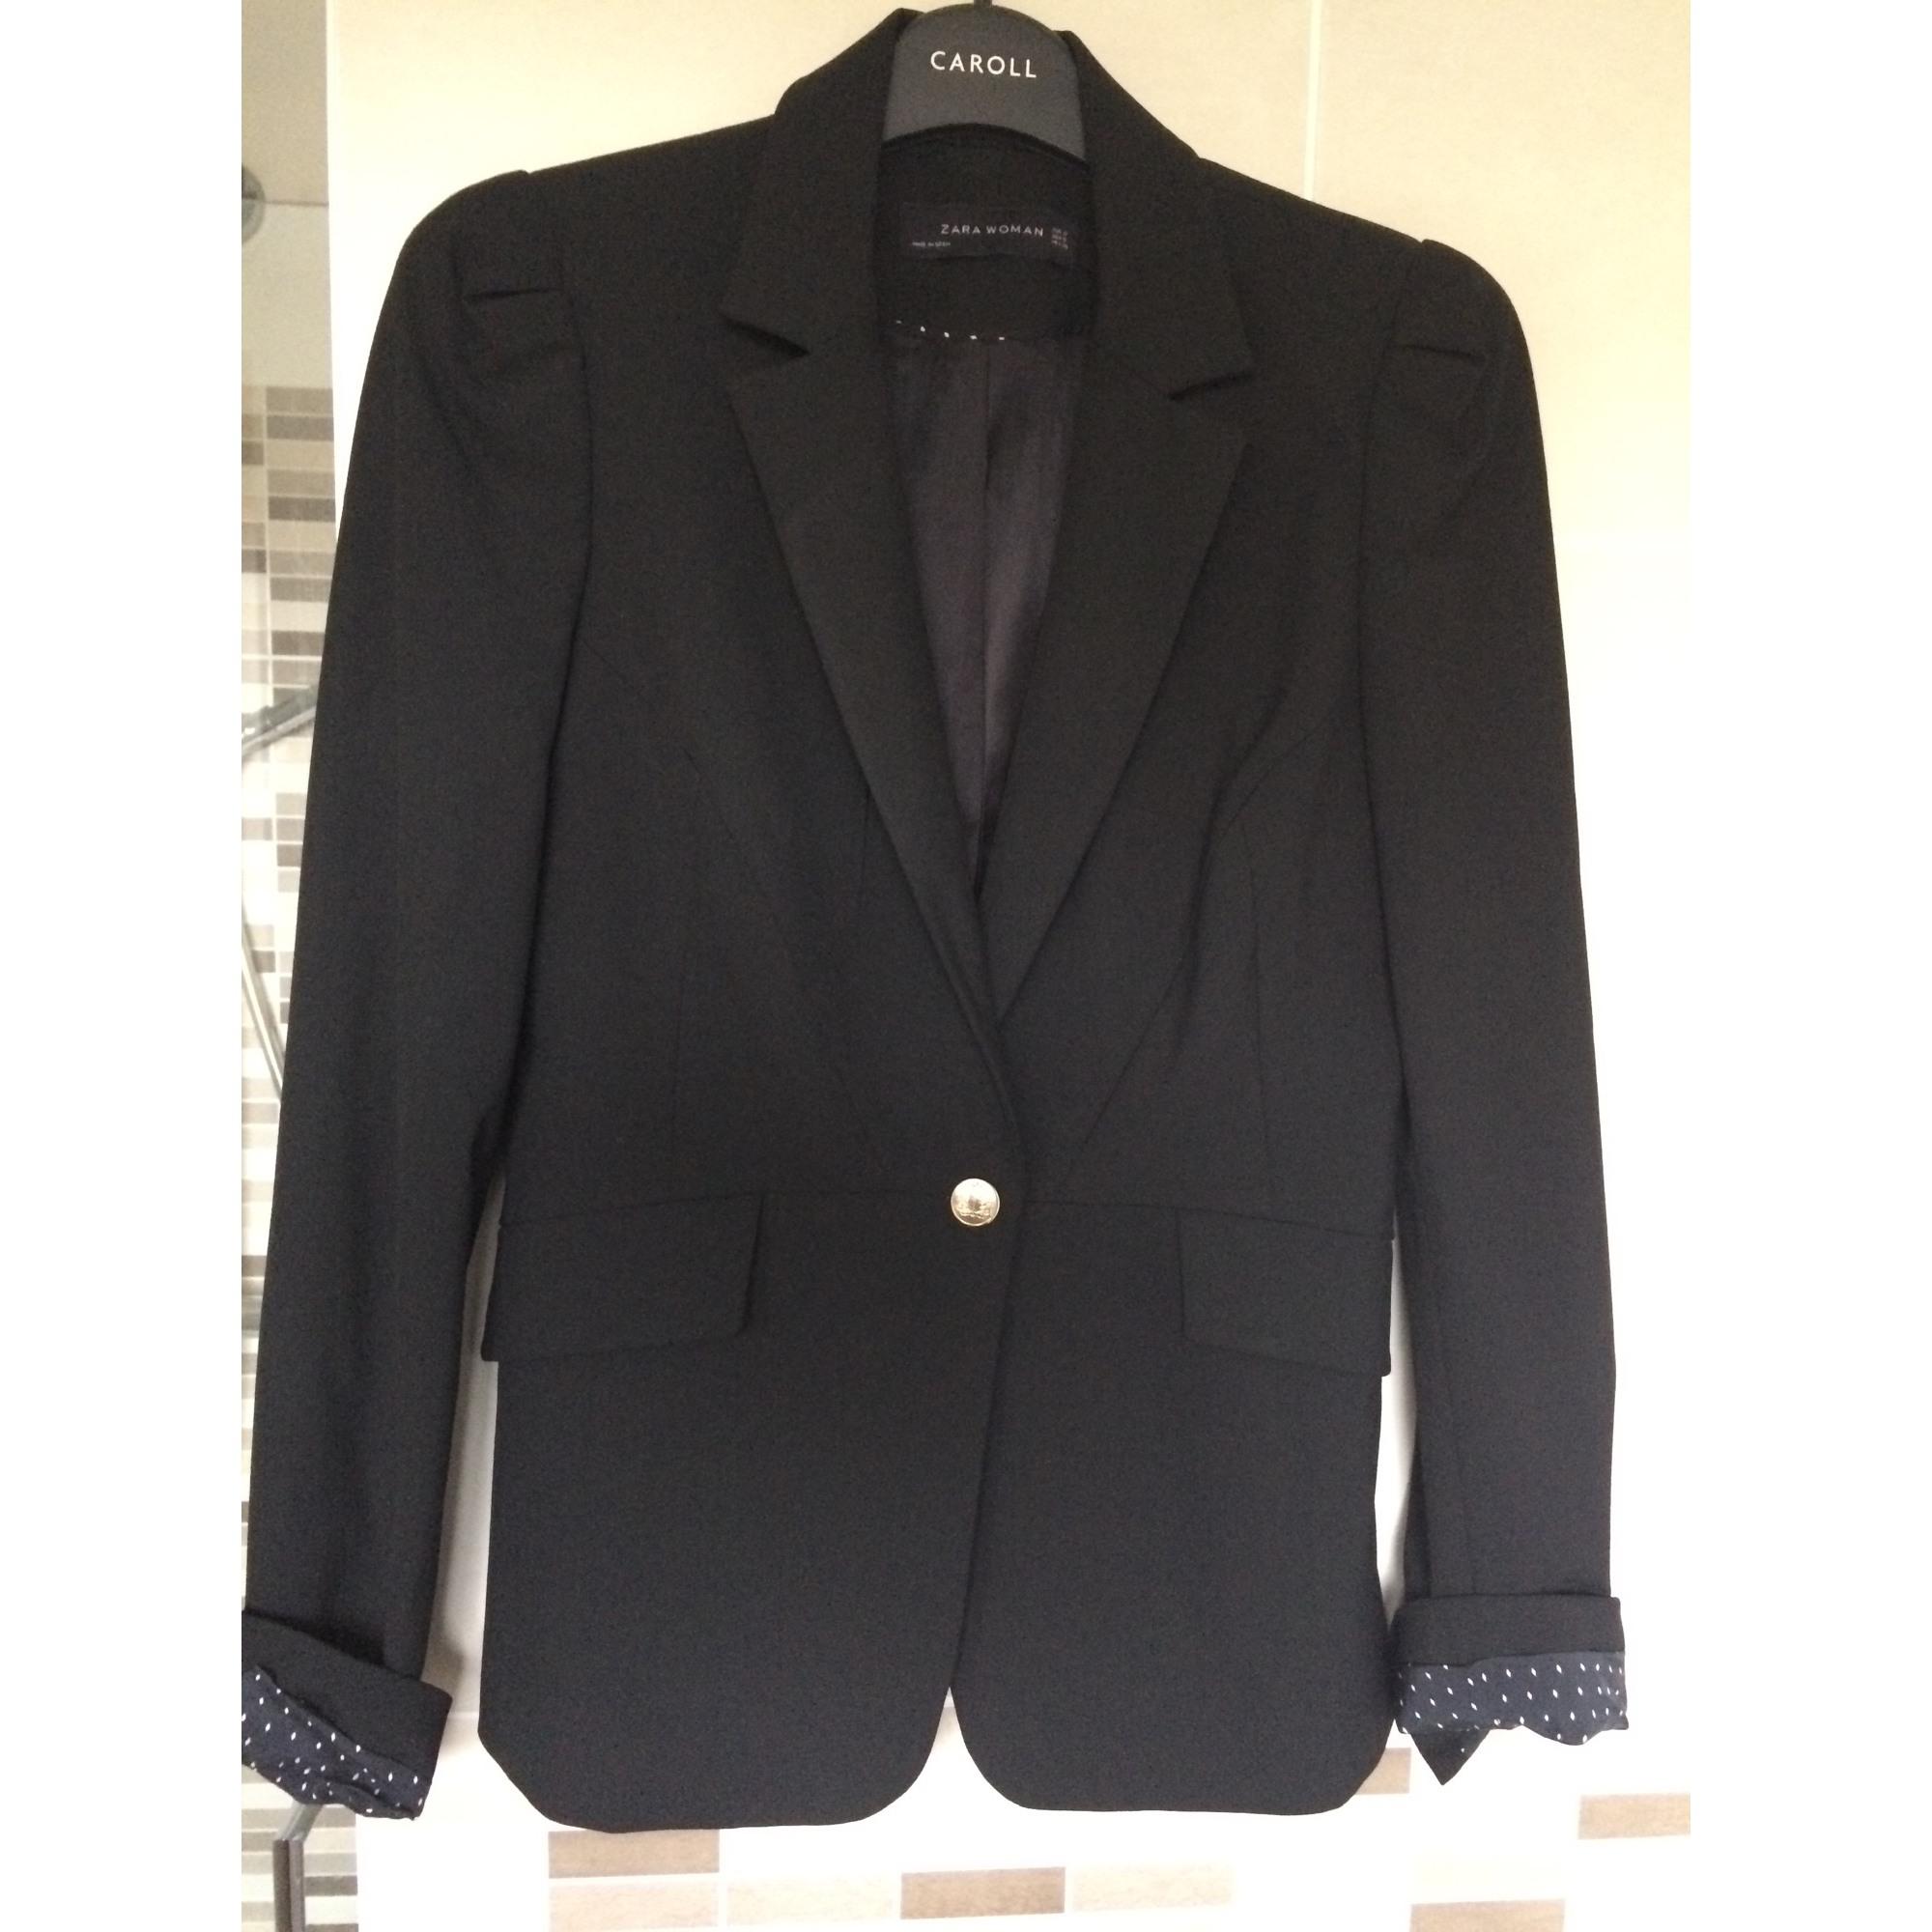 Blazer 6163561 Tailleur 36 Zara Noir Veste T1 s f0Prqwfgxz